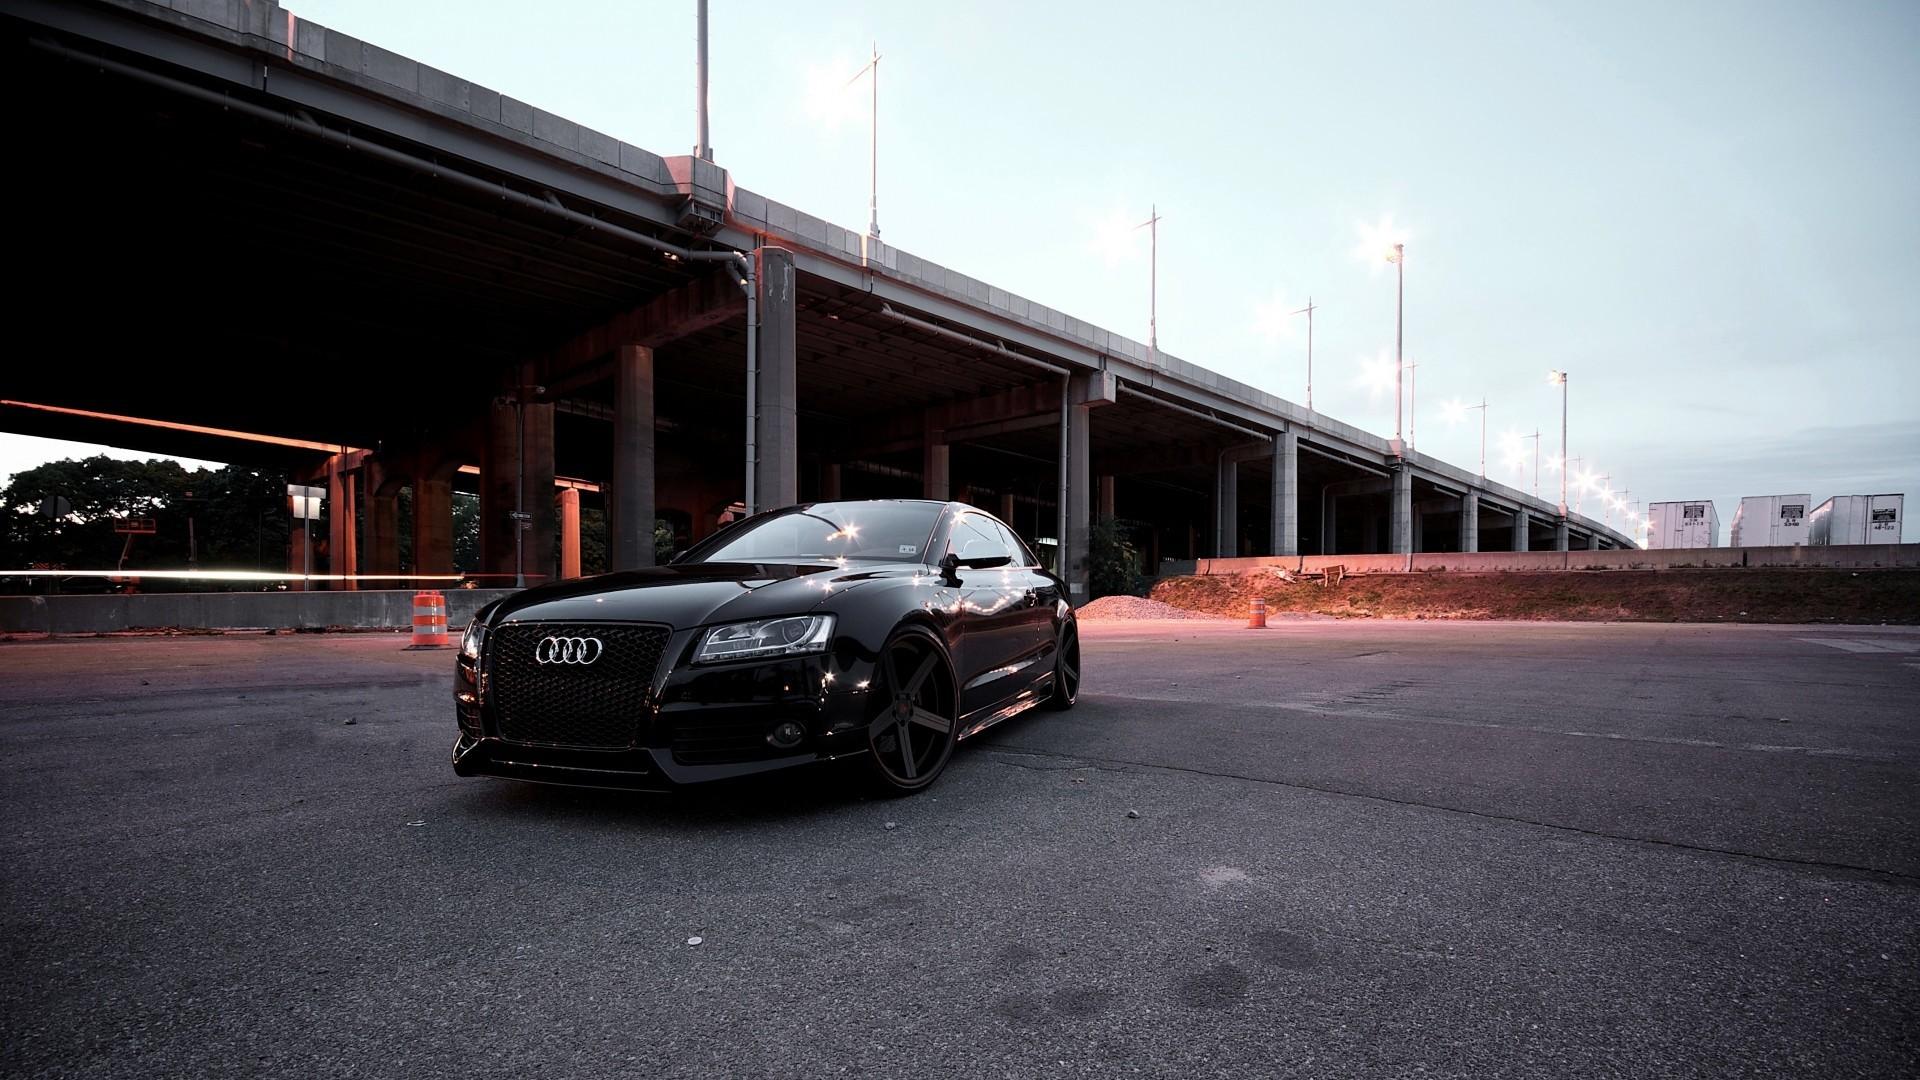 Great 1920x1080 Audi RS5 2015 Black